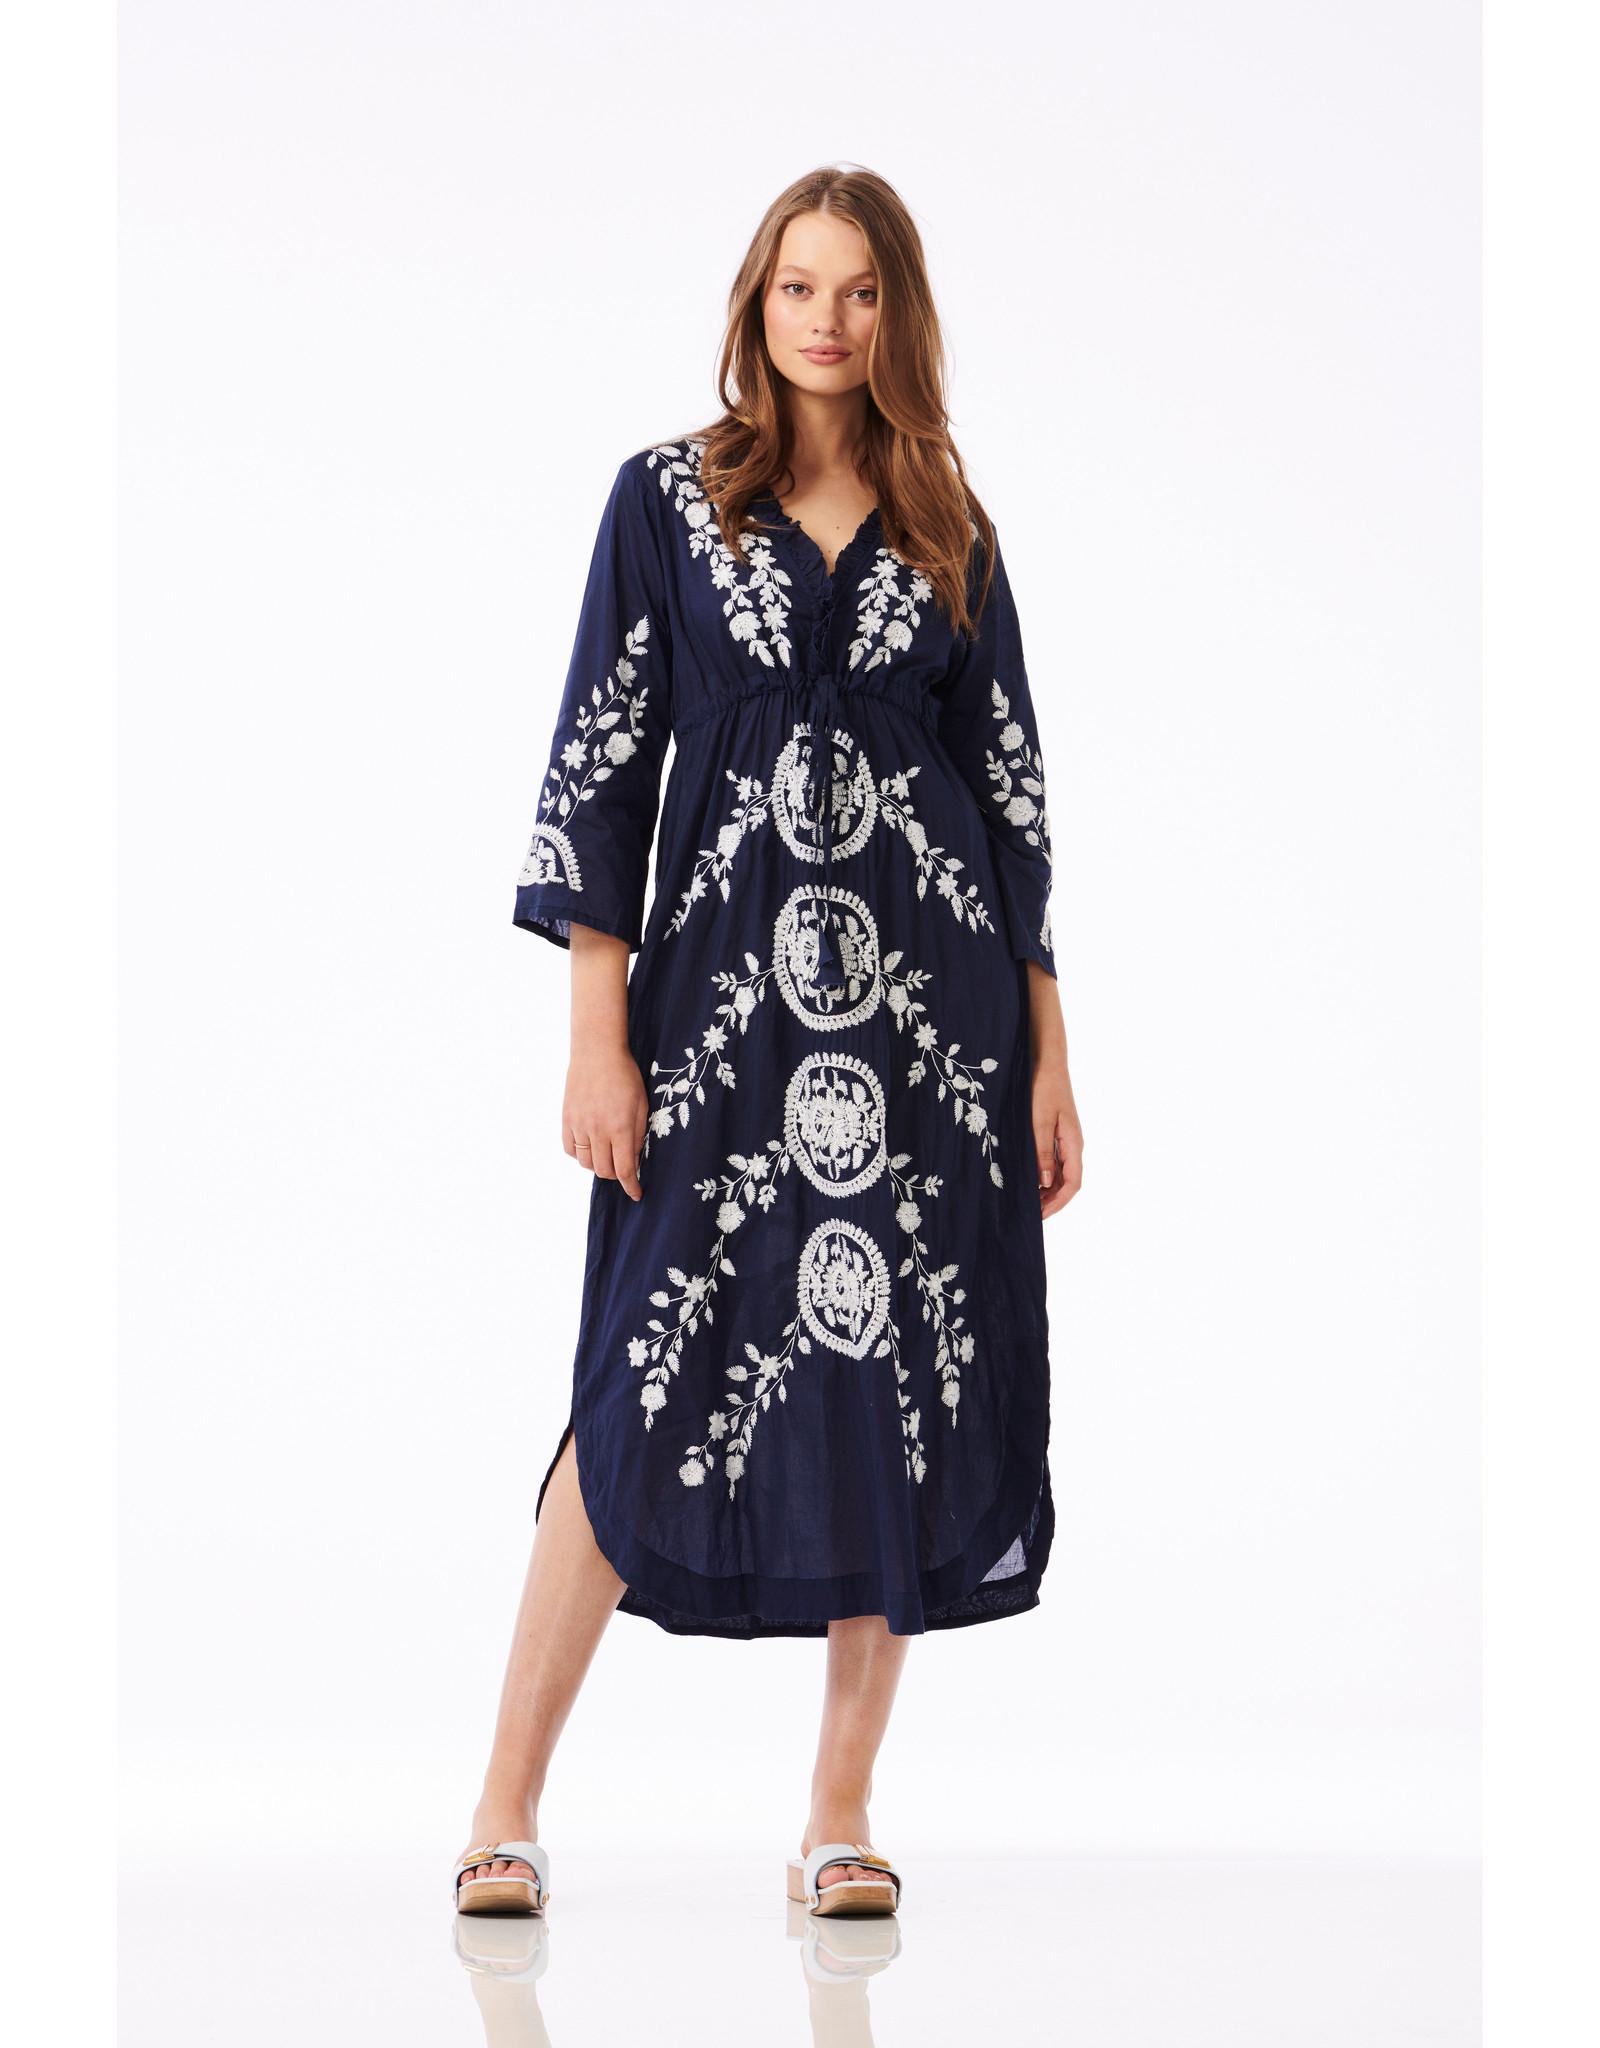 ONESEASON LONG BYRON DRESS NAVY WHITE